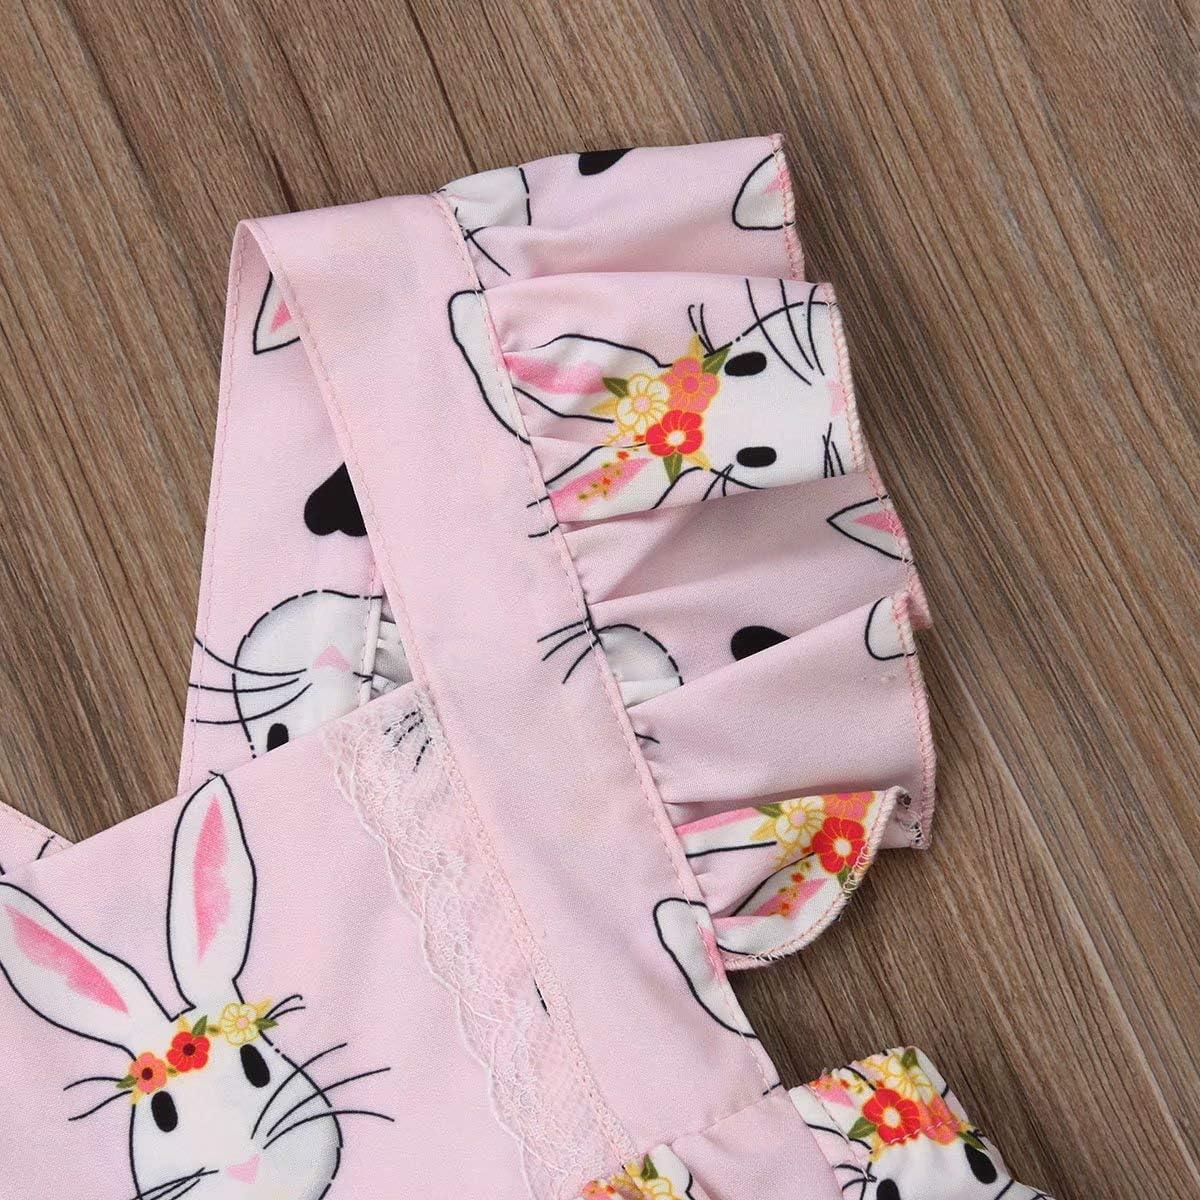 Geagodelia Newborn Infant Baby Girls Summer Easter Bodysuit Rabbit Romper Ruffled Sleeveless Backless Pink Jumpsuits